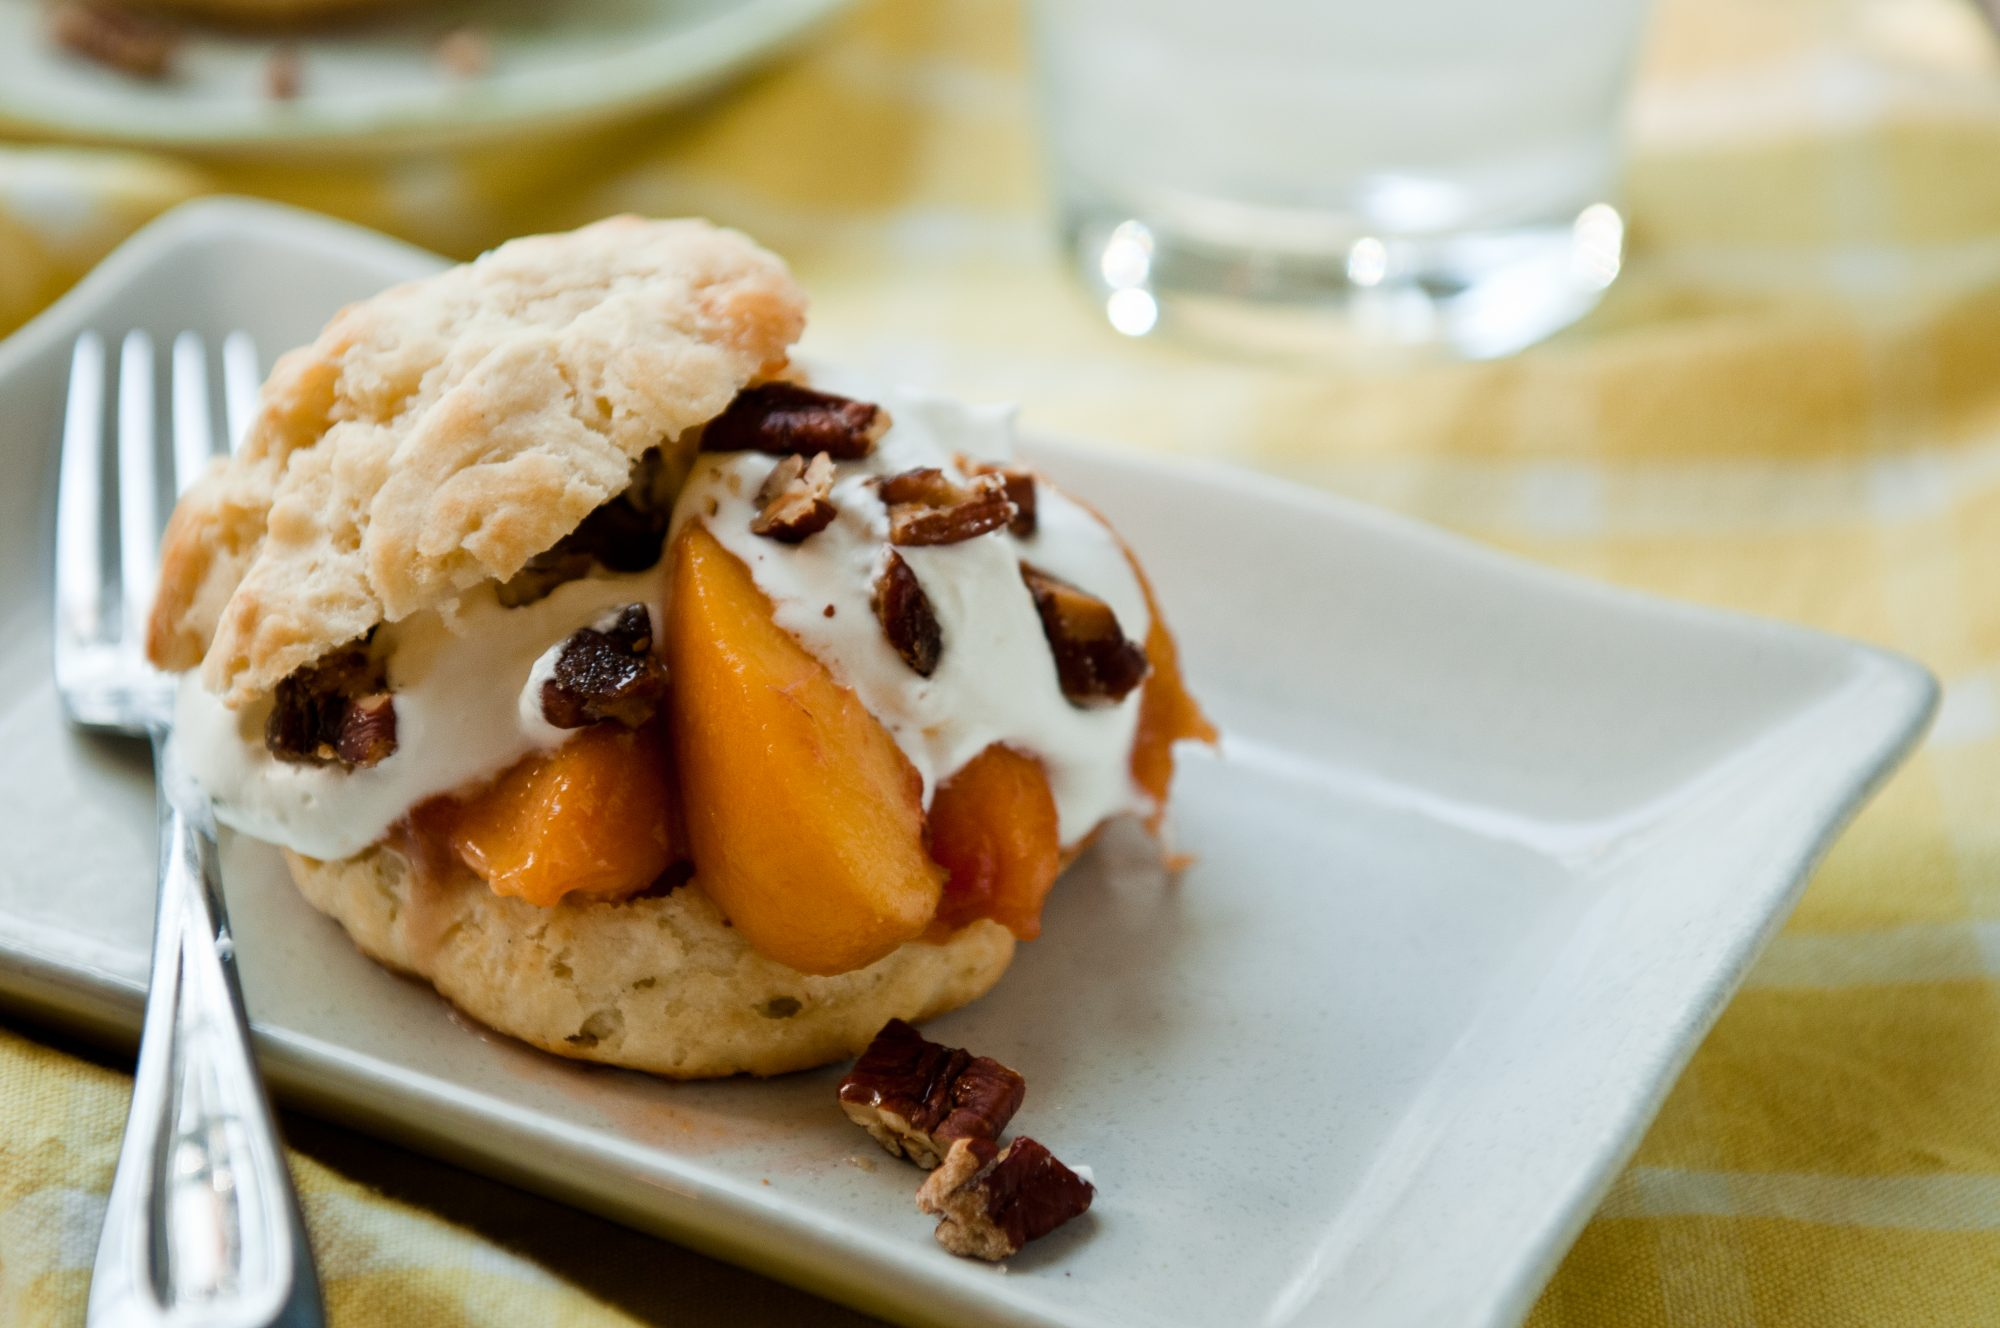 Bourbon-Peach Shortcakes with Glazed Pecans